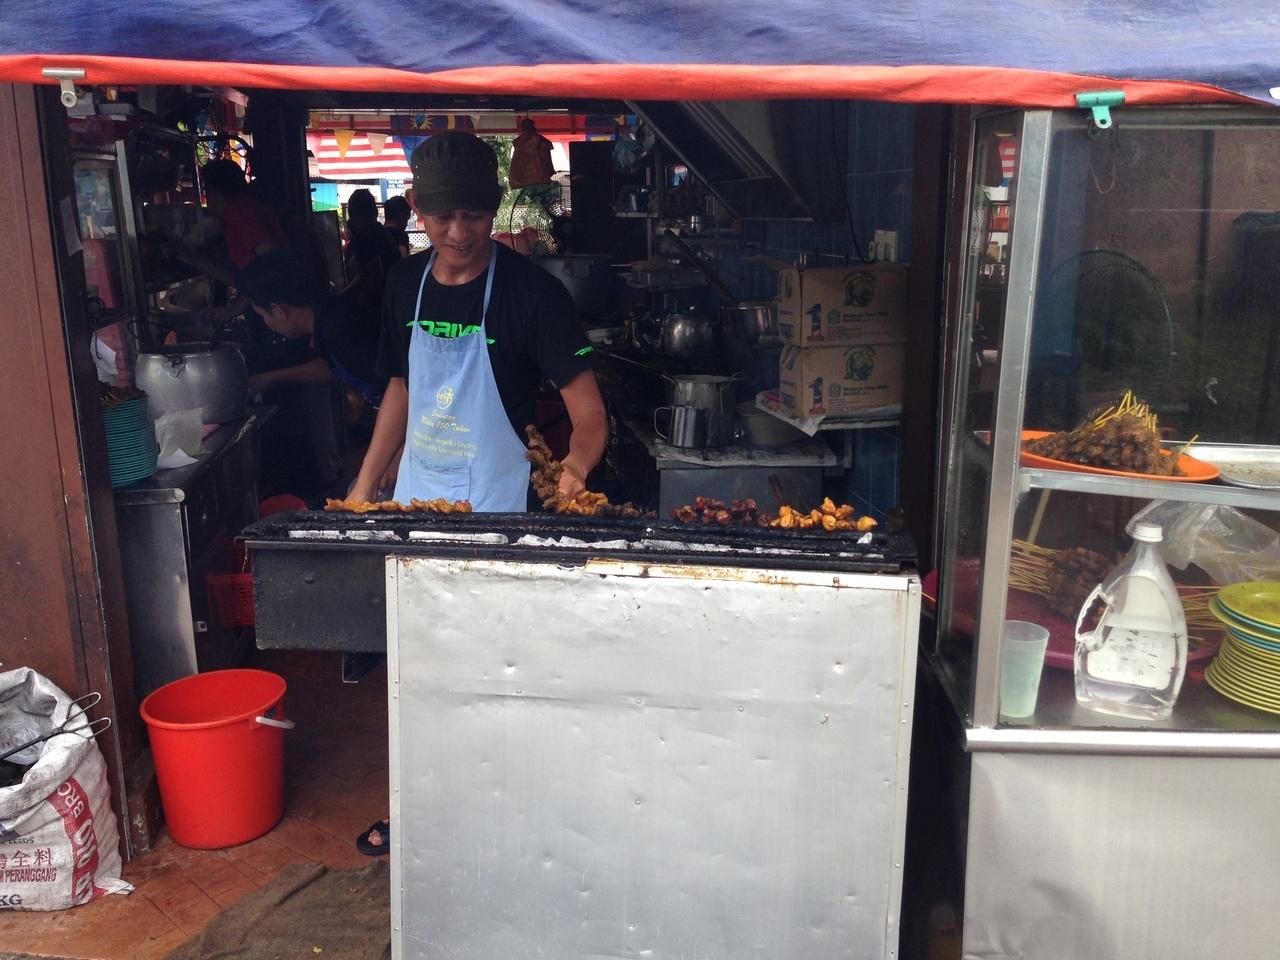 restoran lineclear kampung jawa.resized